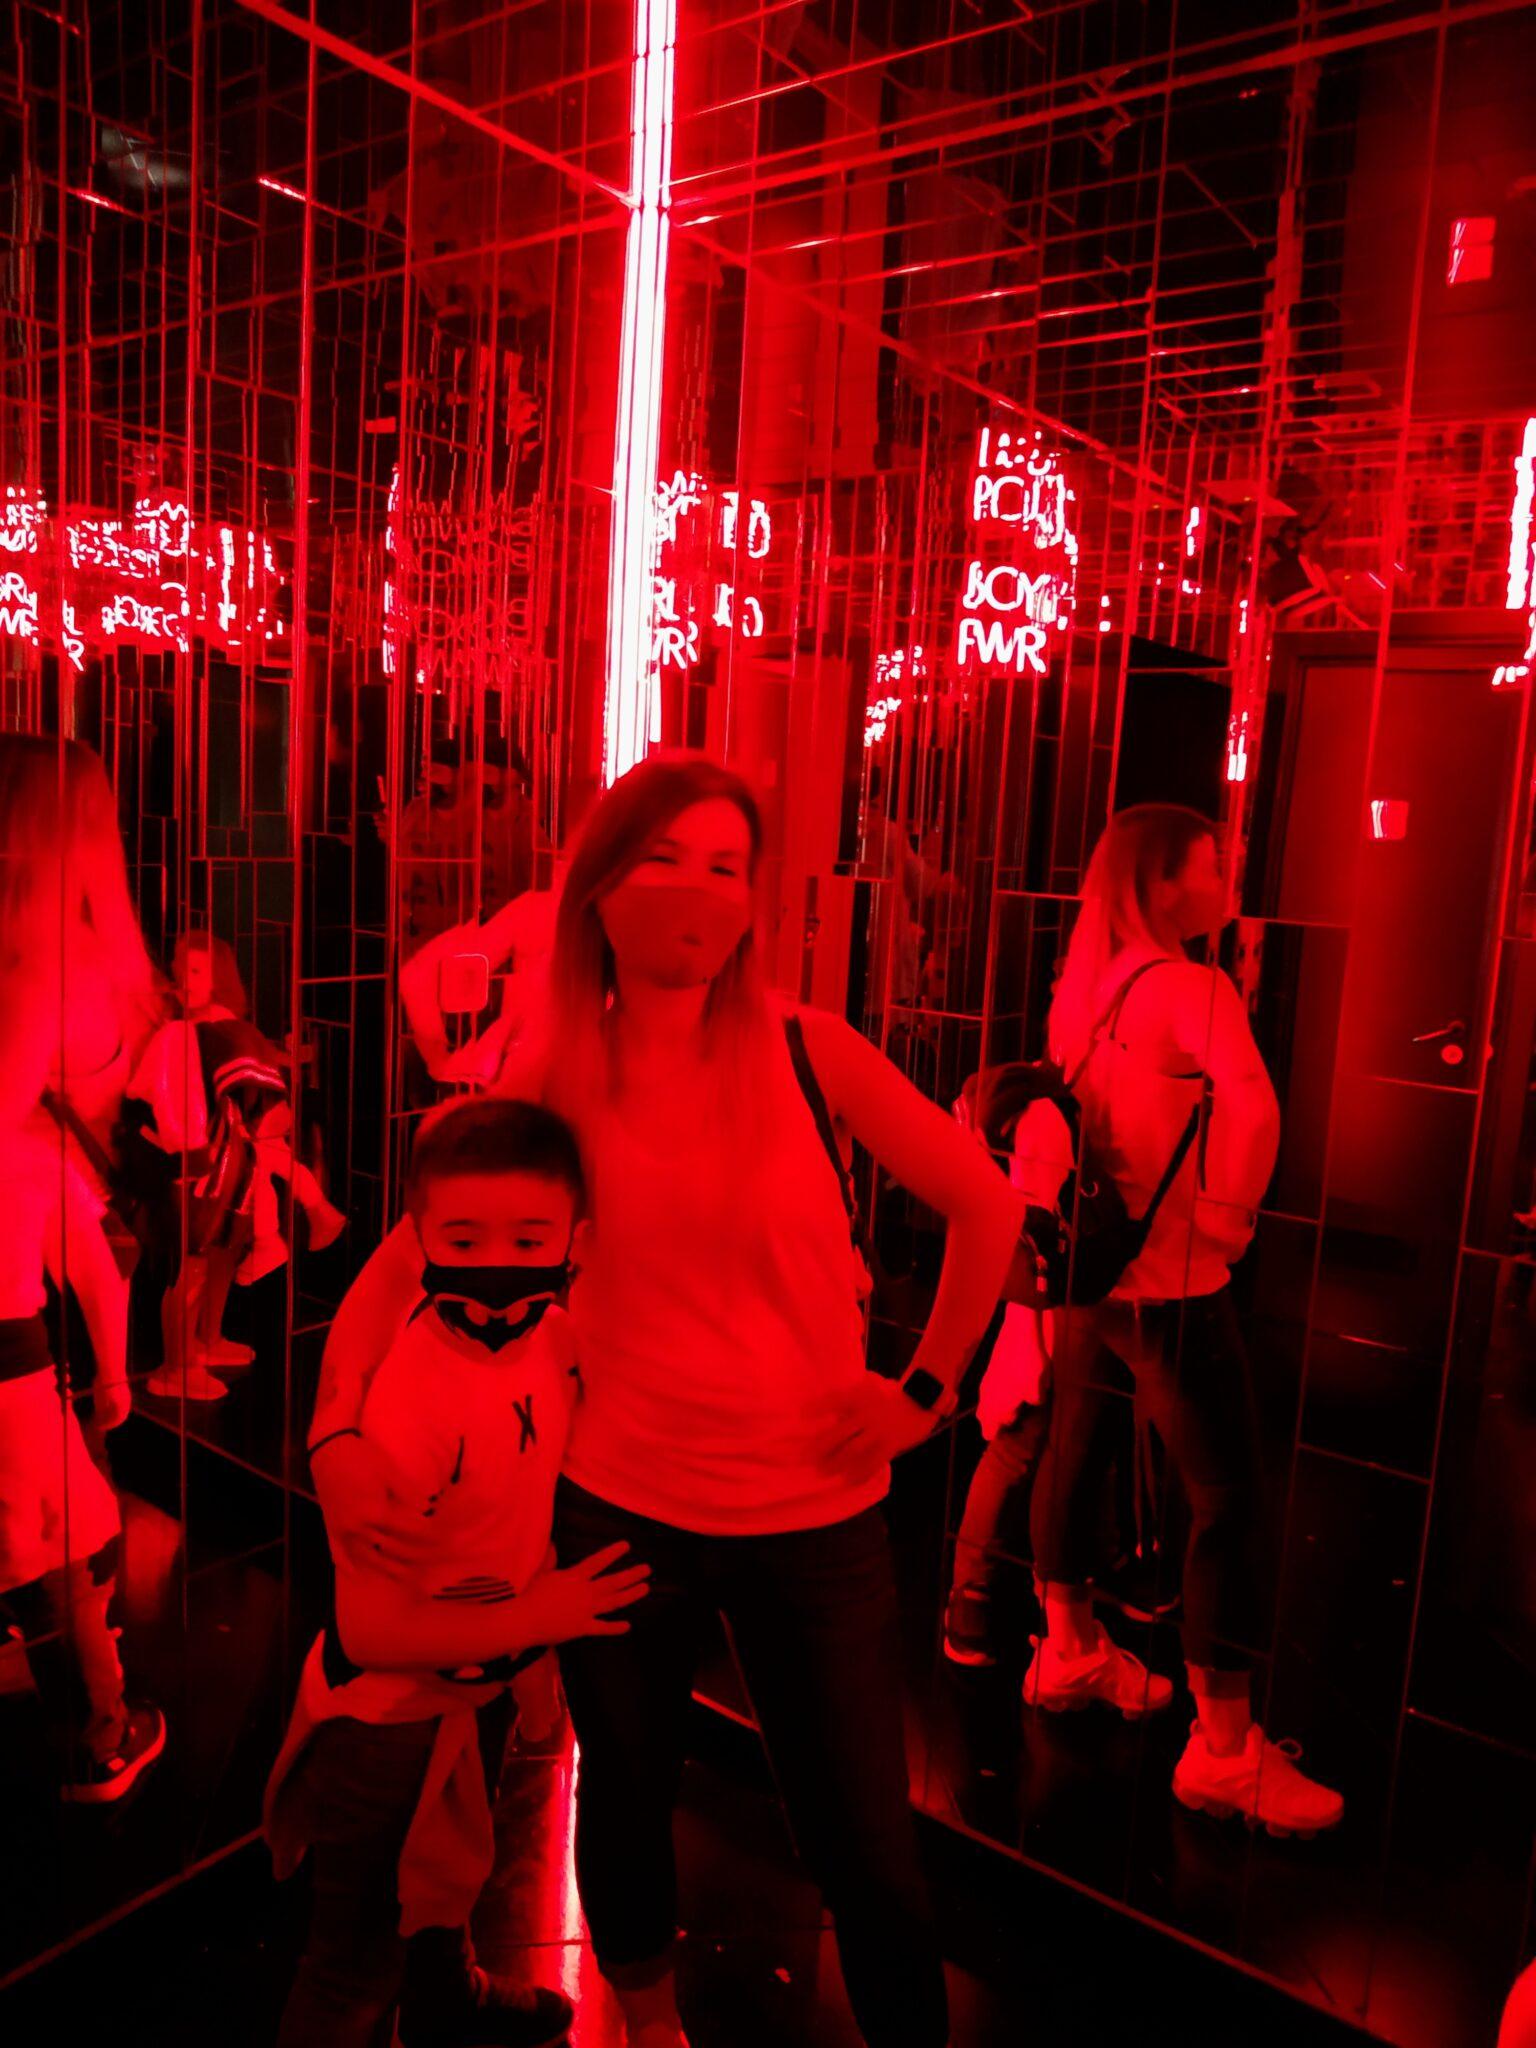 IMG 20200926 170357 01 scaled - Visitar IKONO Madrid con niños